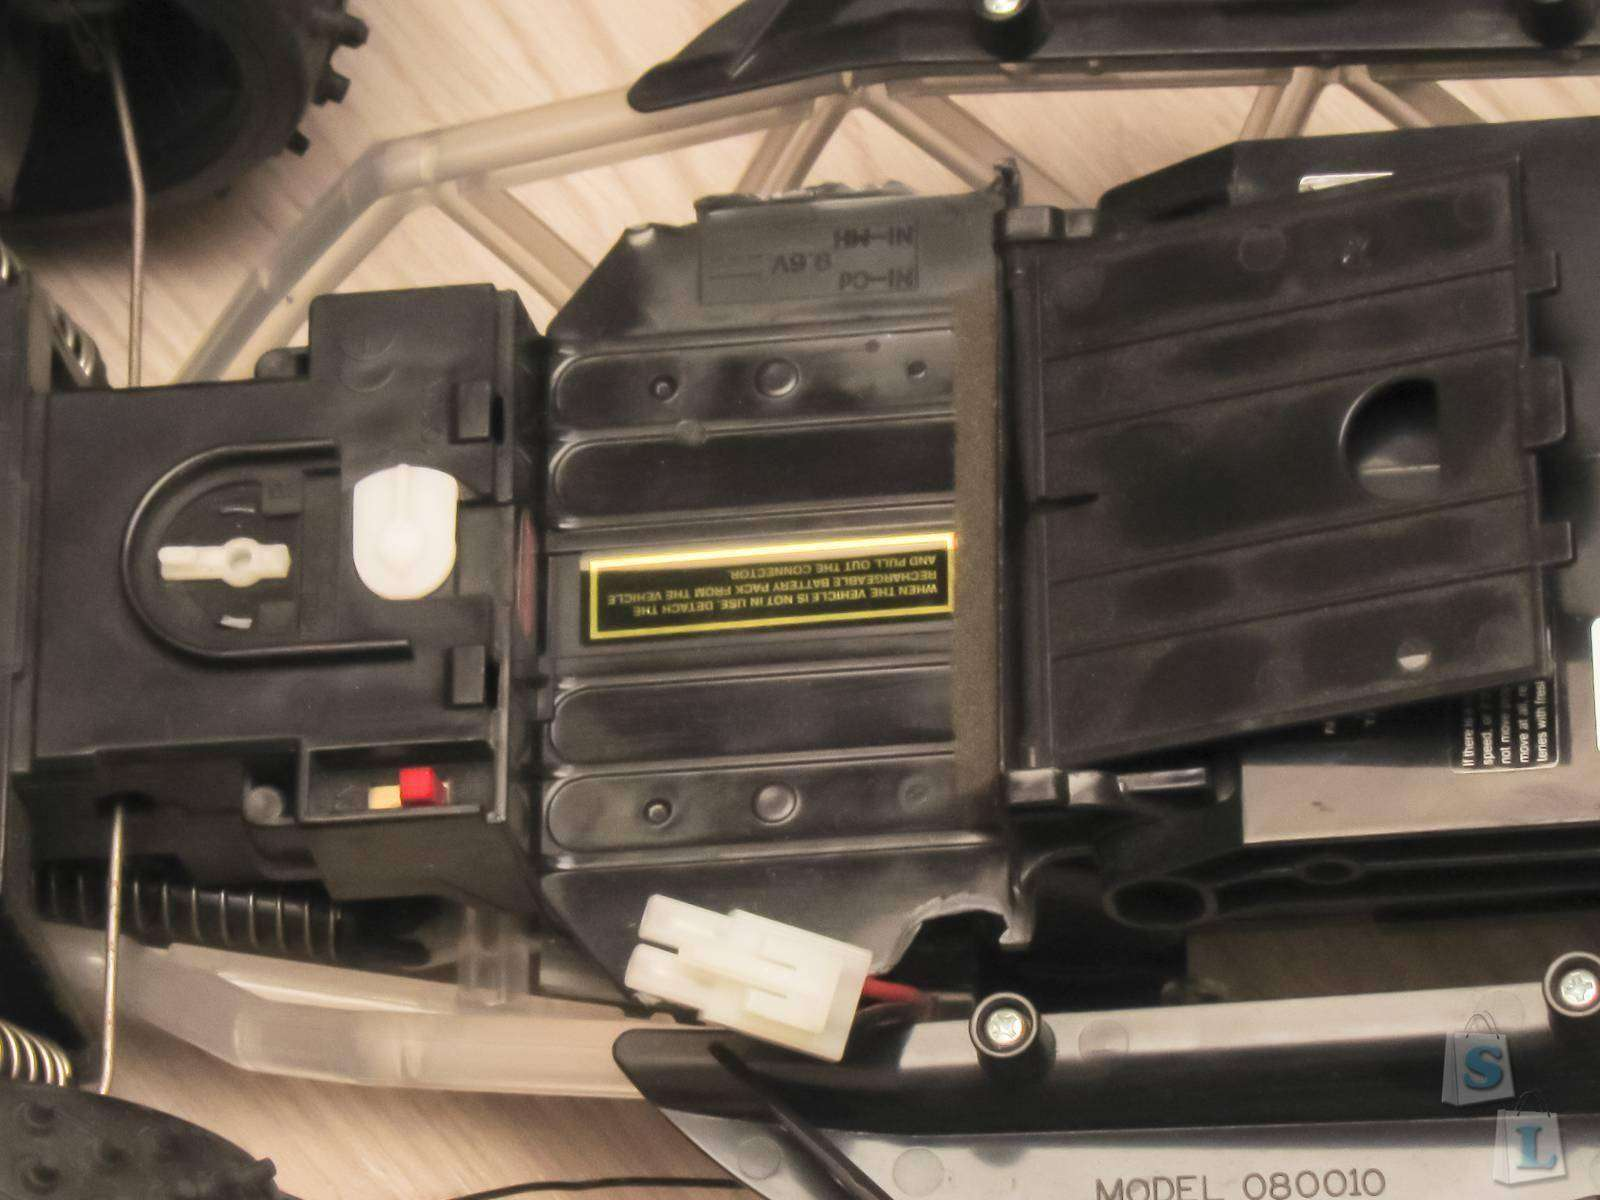 GearBest: Аккумулятор Lion Power 11.1V 1300mAh - вторая жизнь старой RC машинки